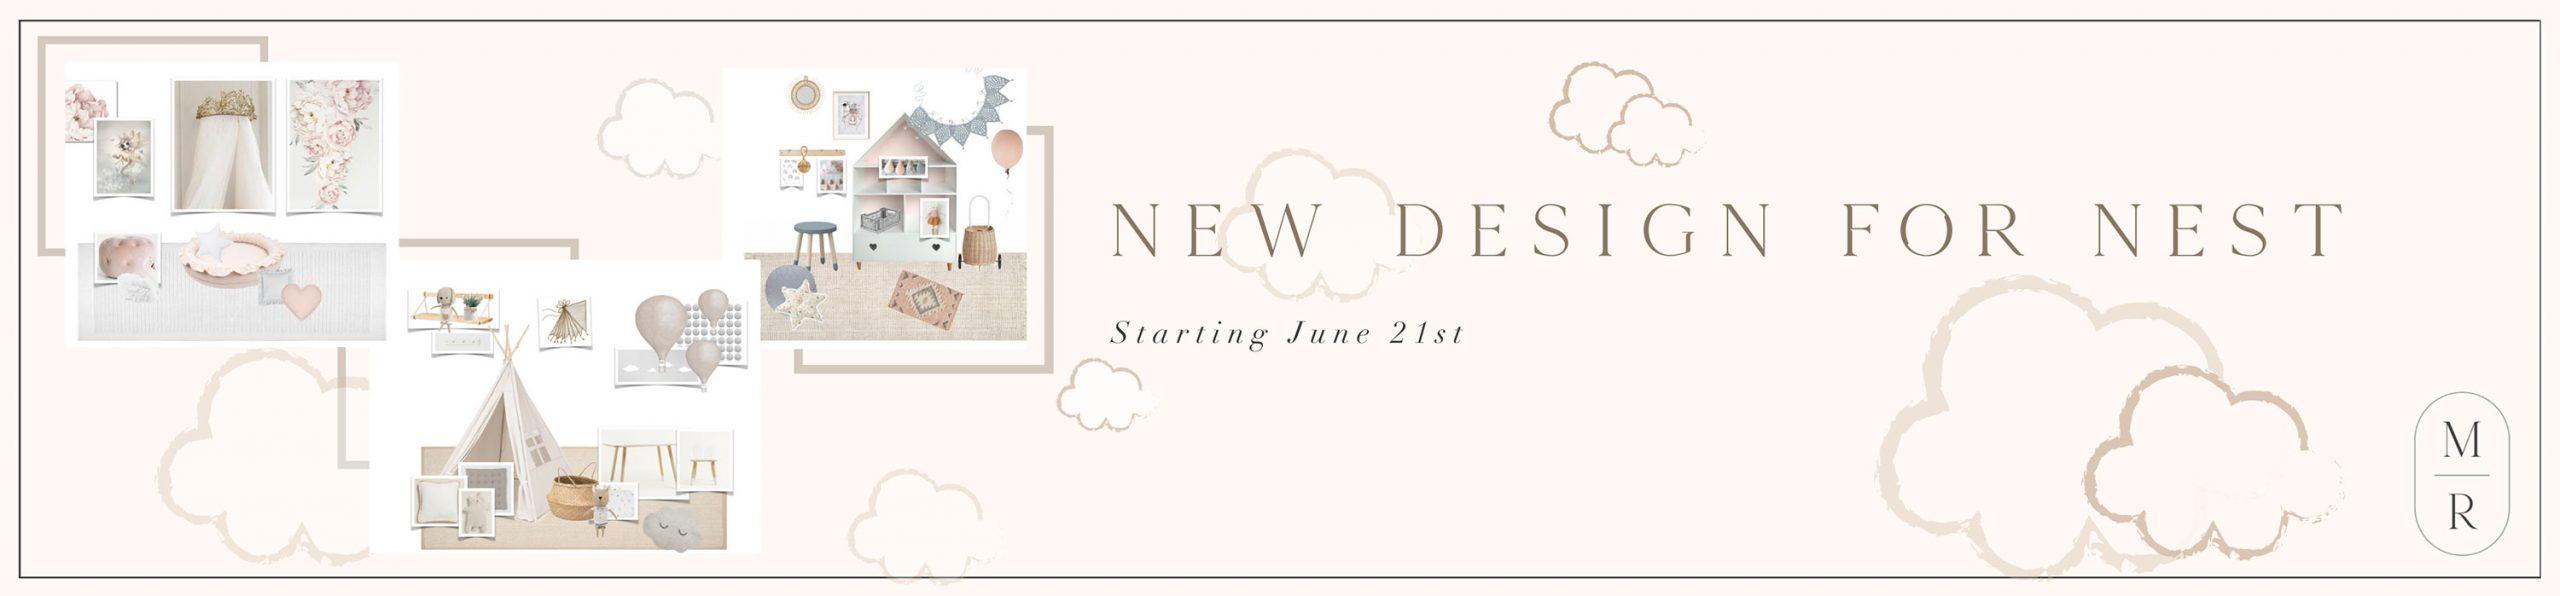 Nest redesign